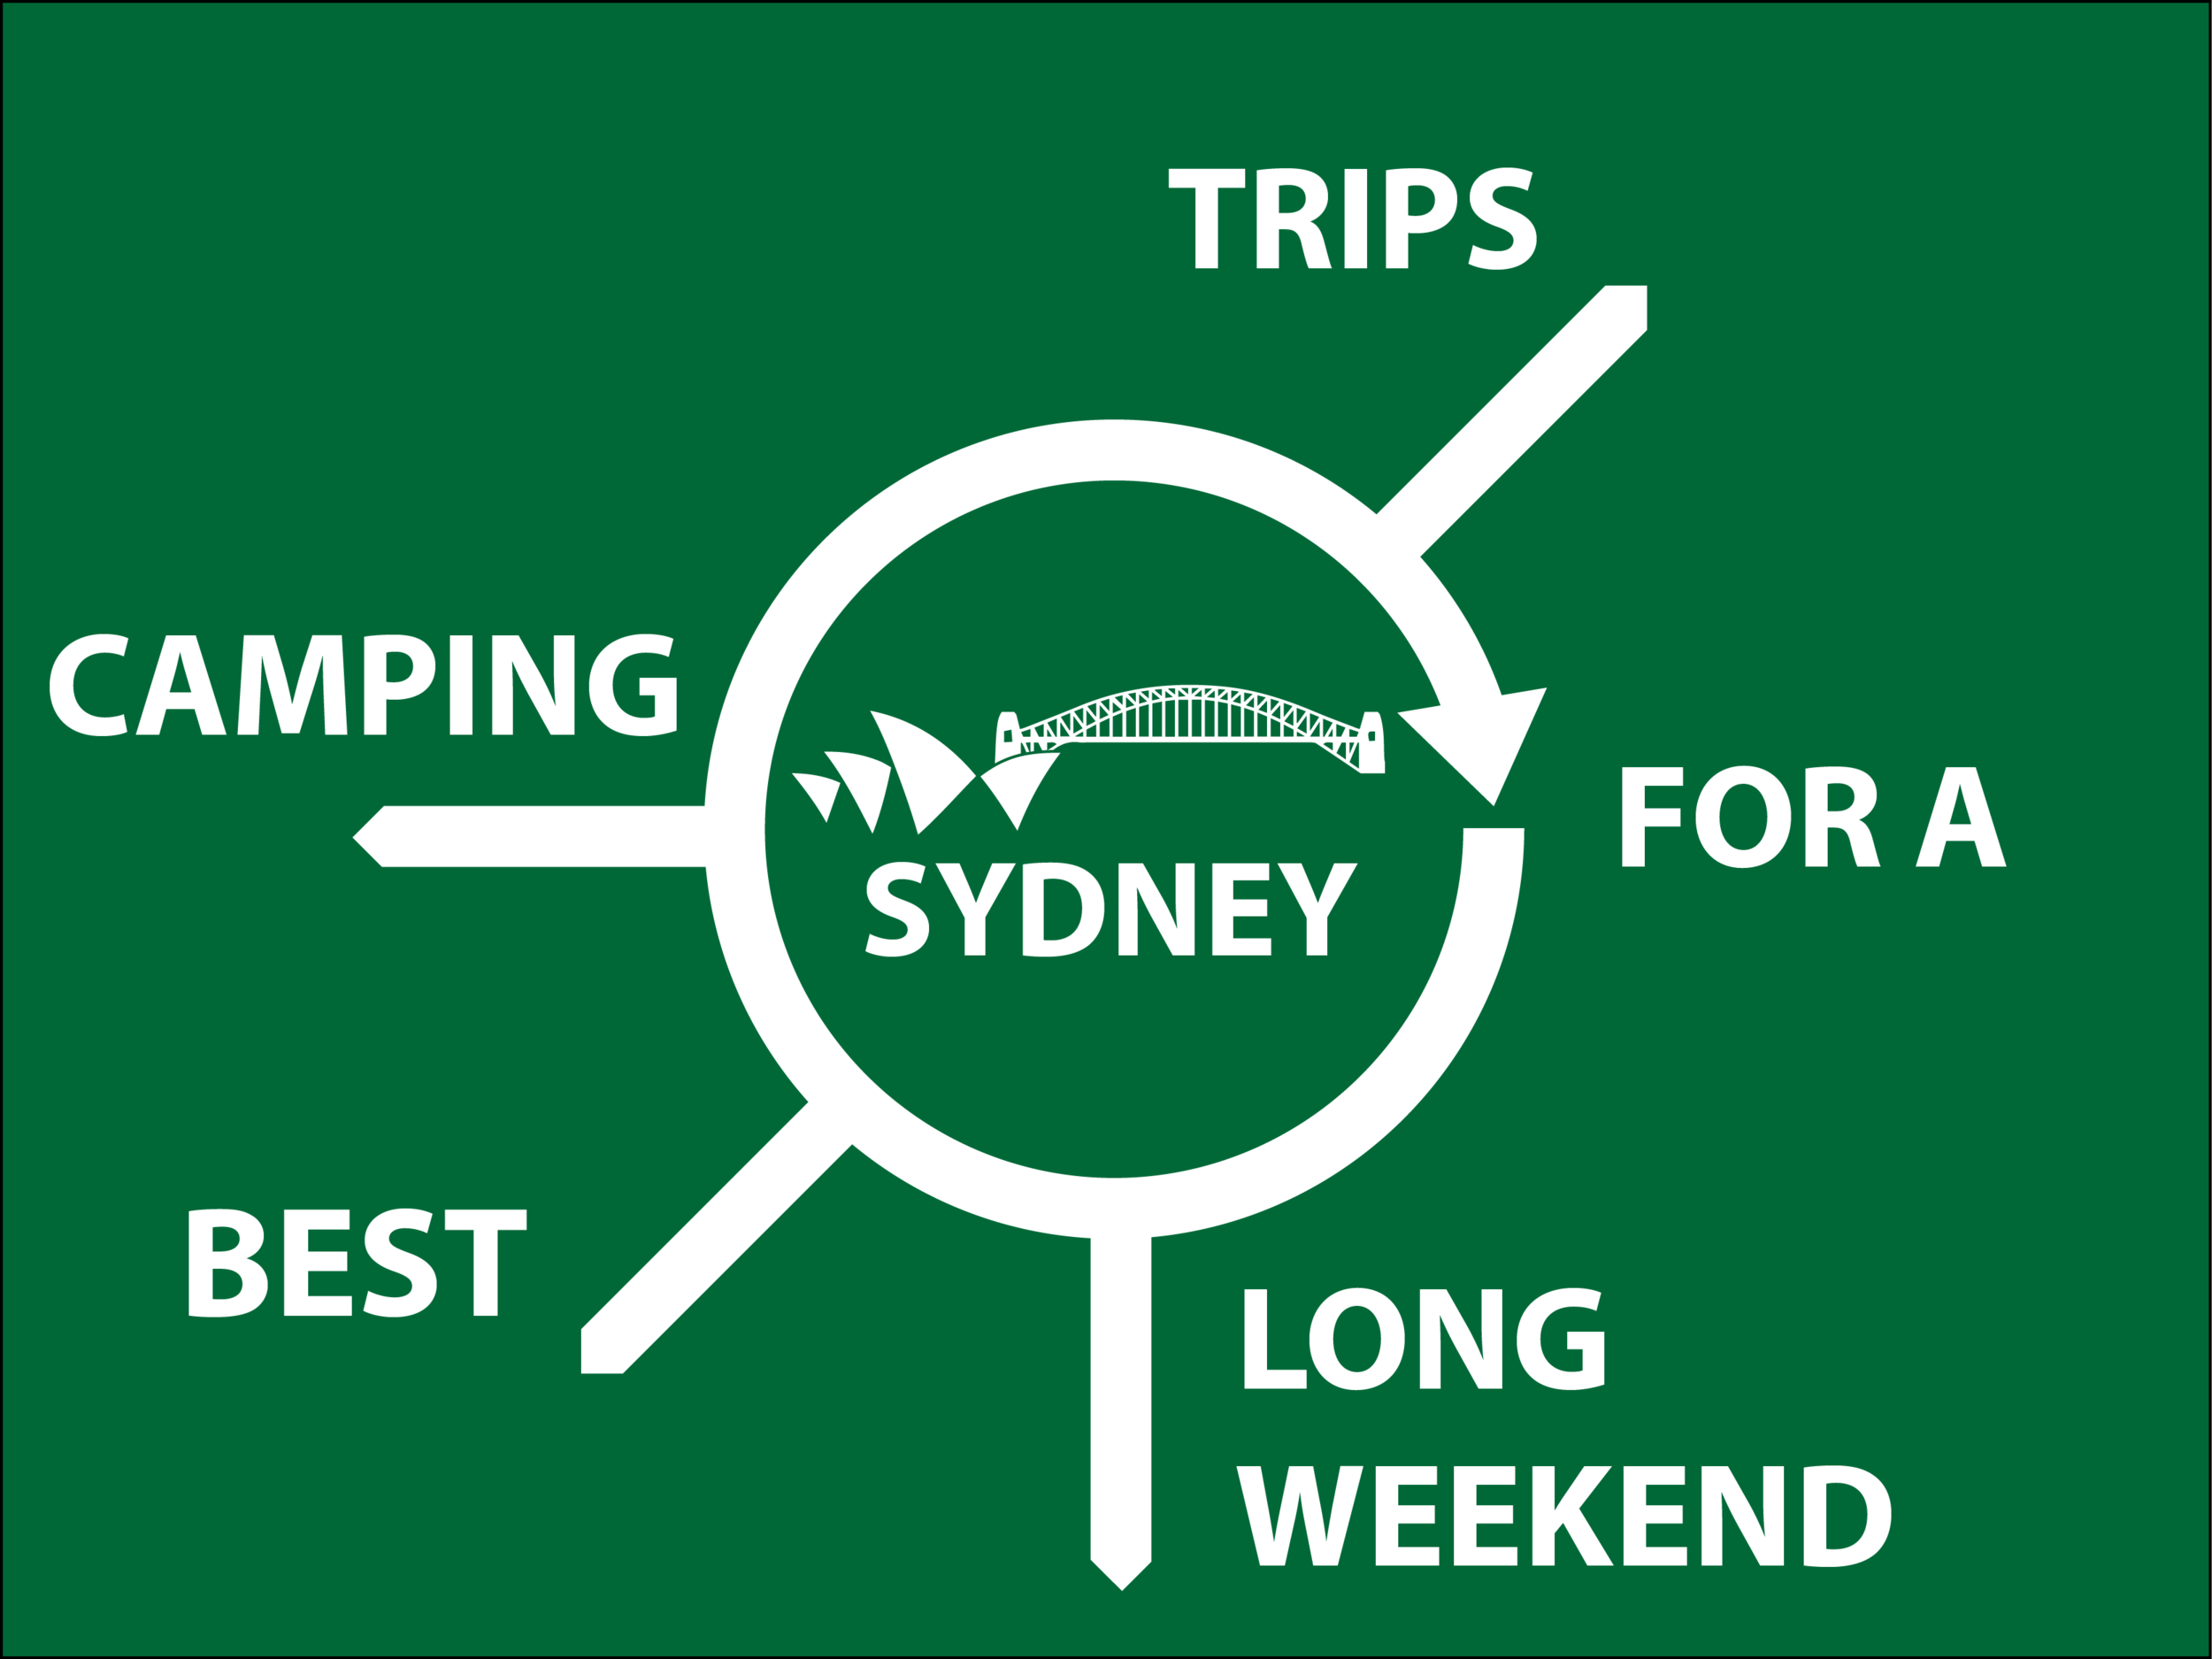 CampingTrip.png